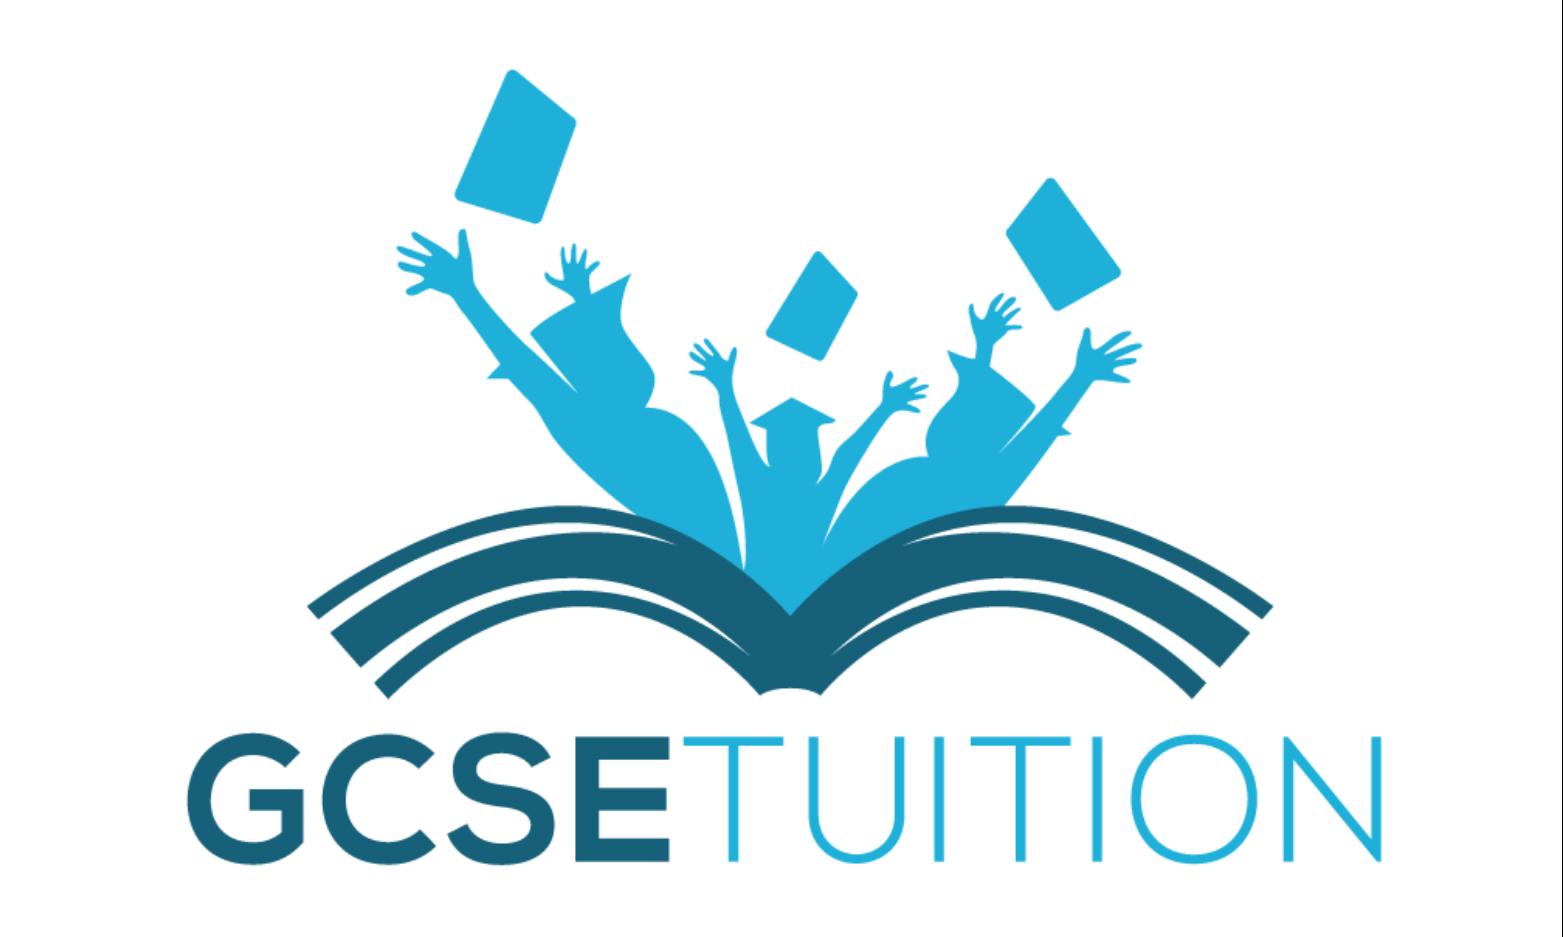 GCSE Tuition